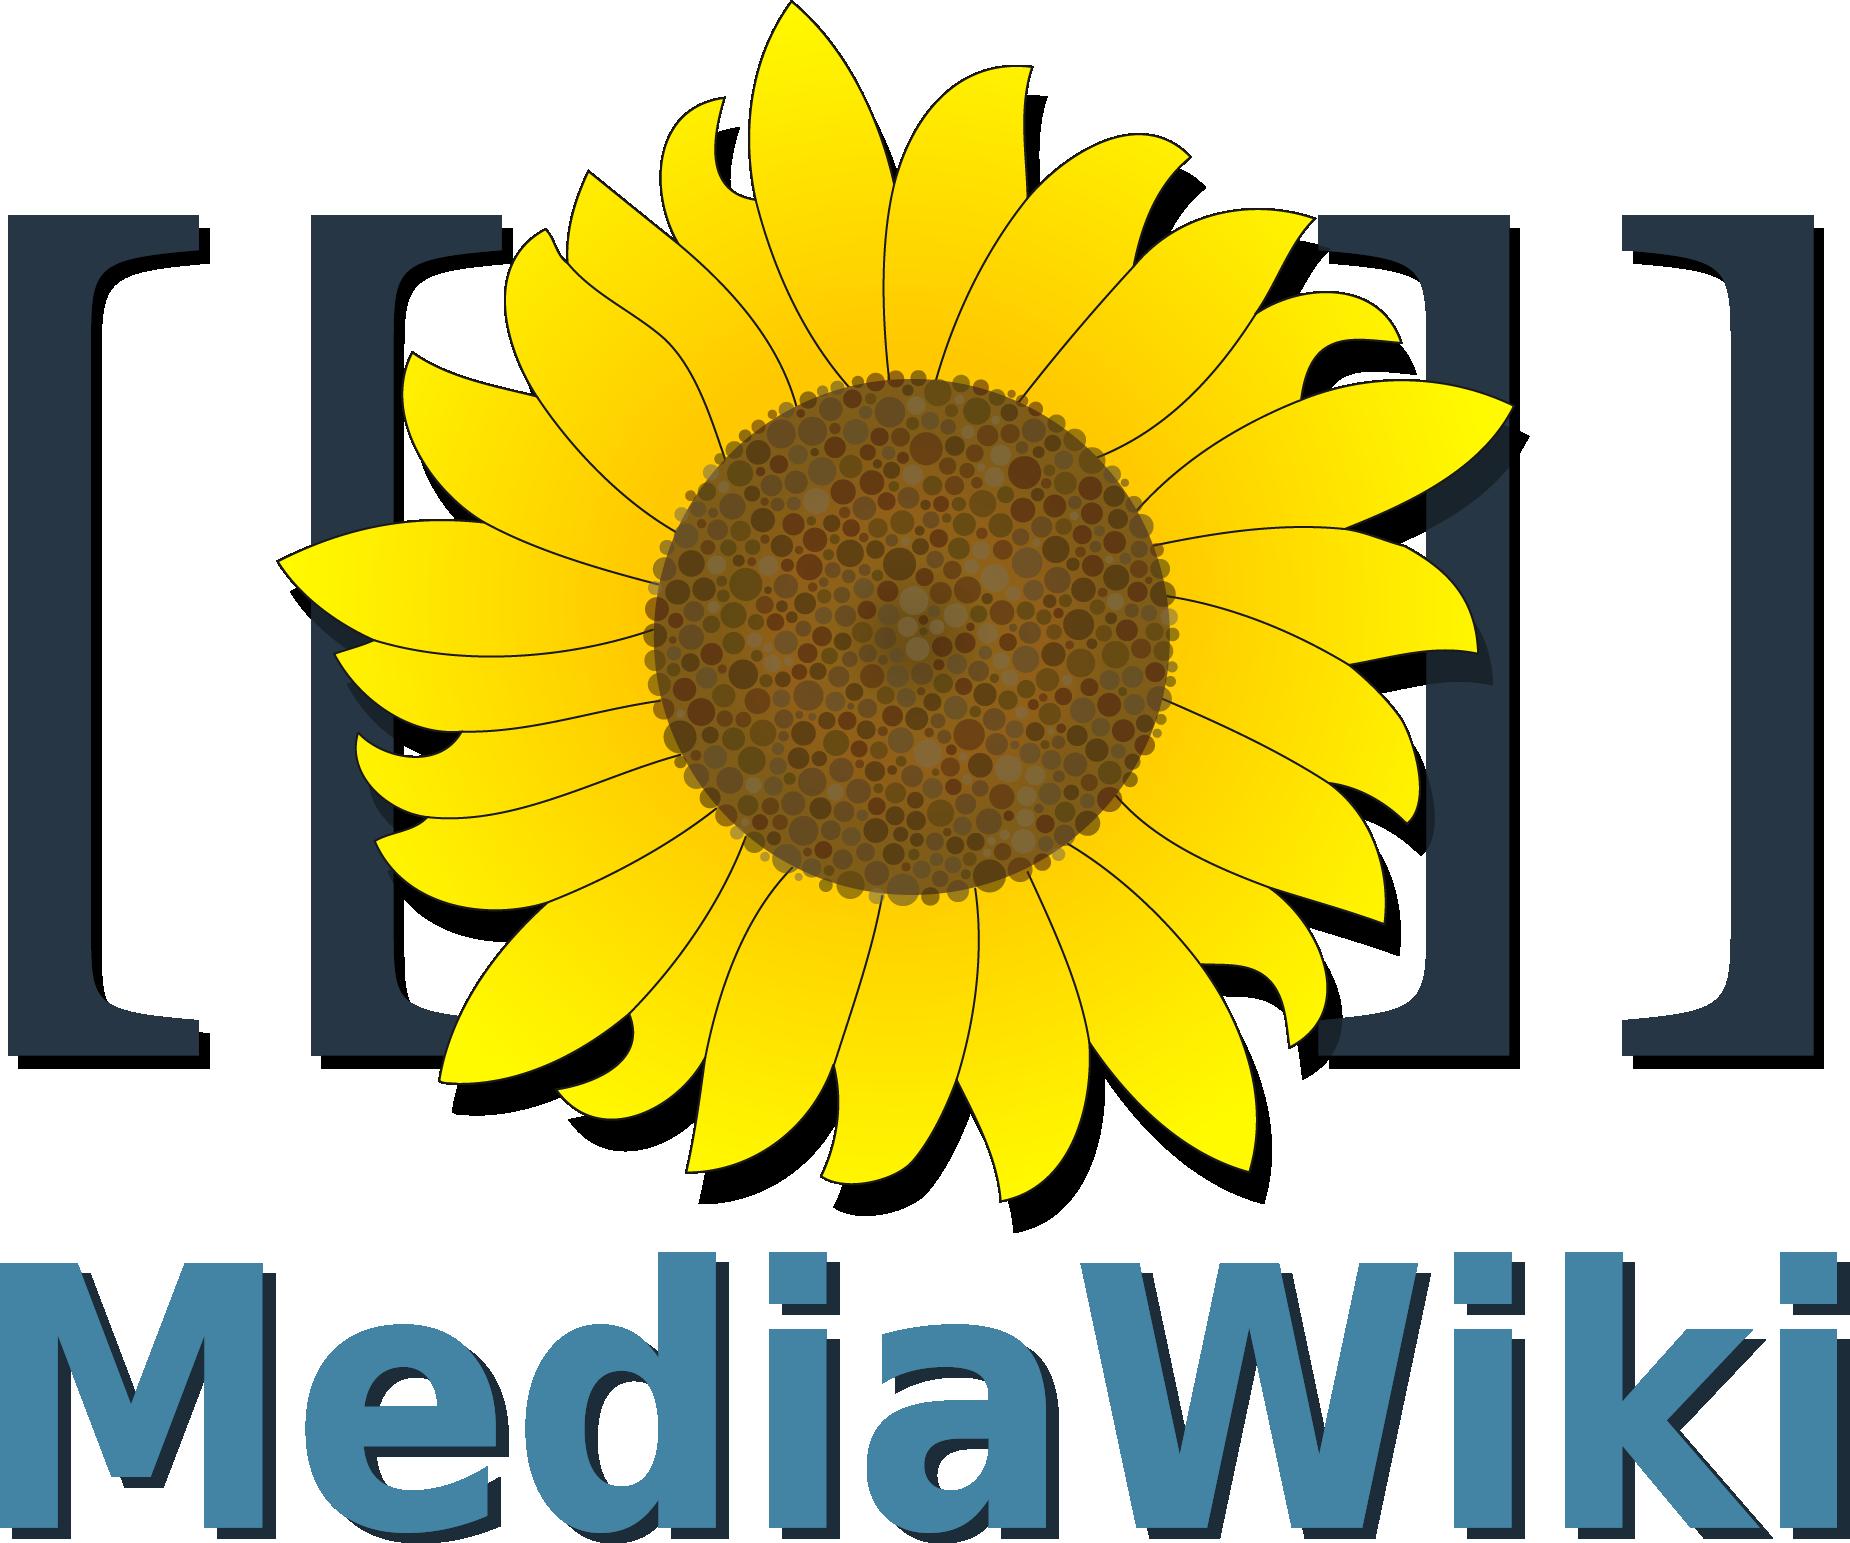 Mediawiki's logo